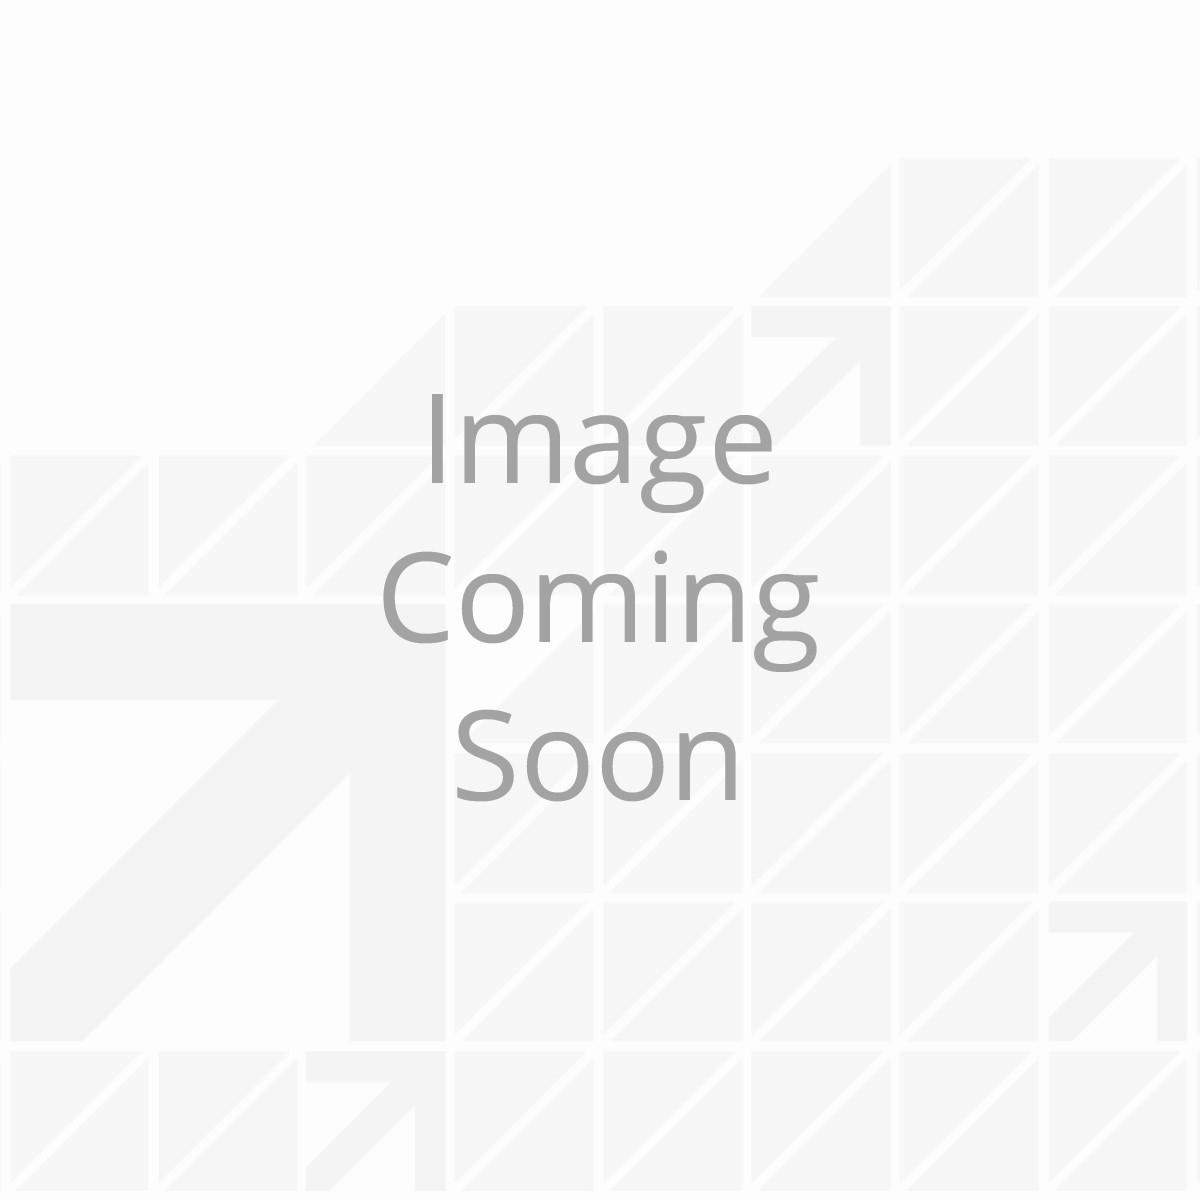 17' Destination Awning Roller Assembly - Solid Black (Black Shield)